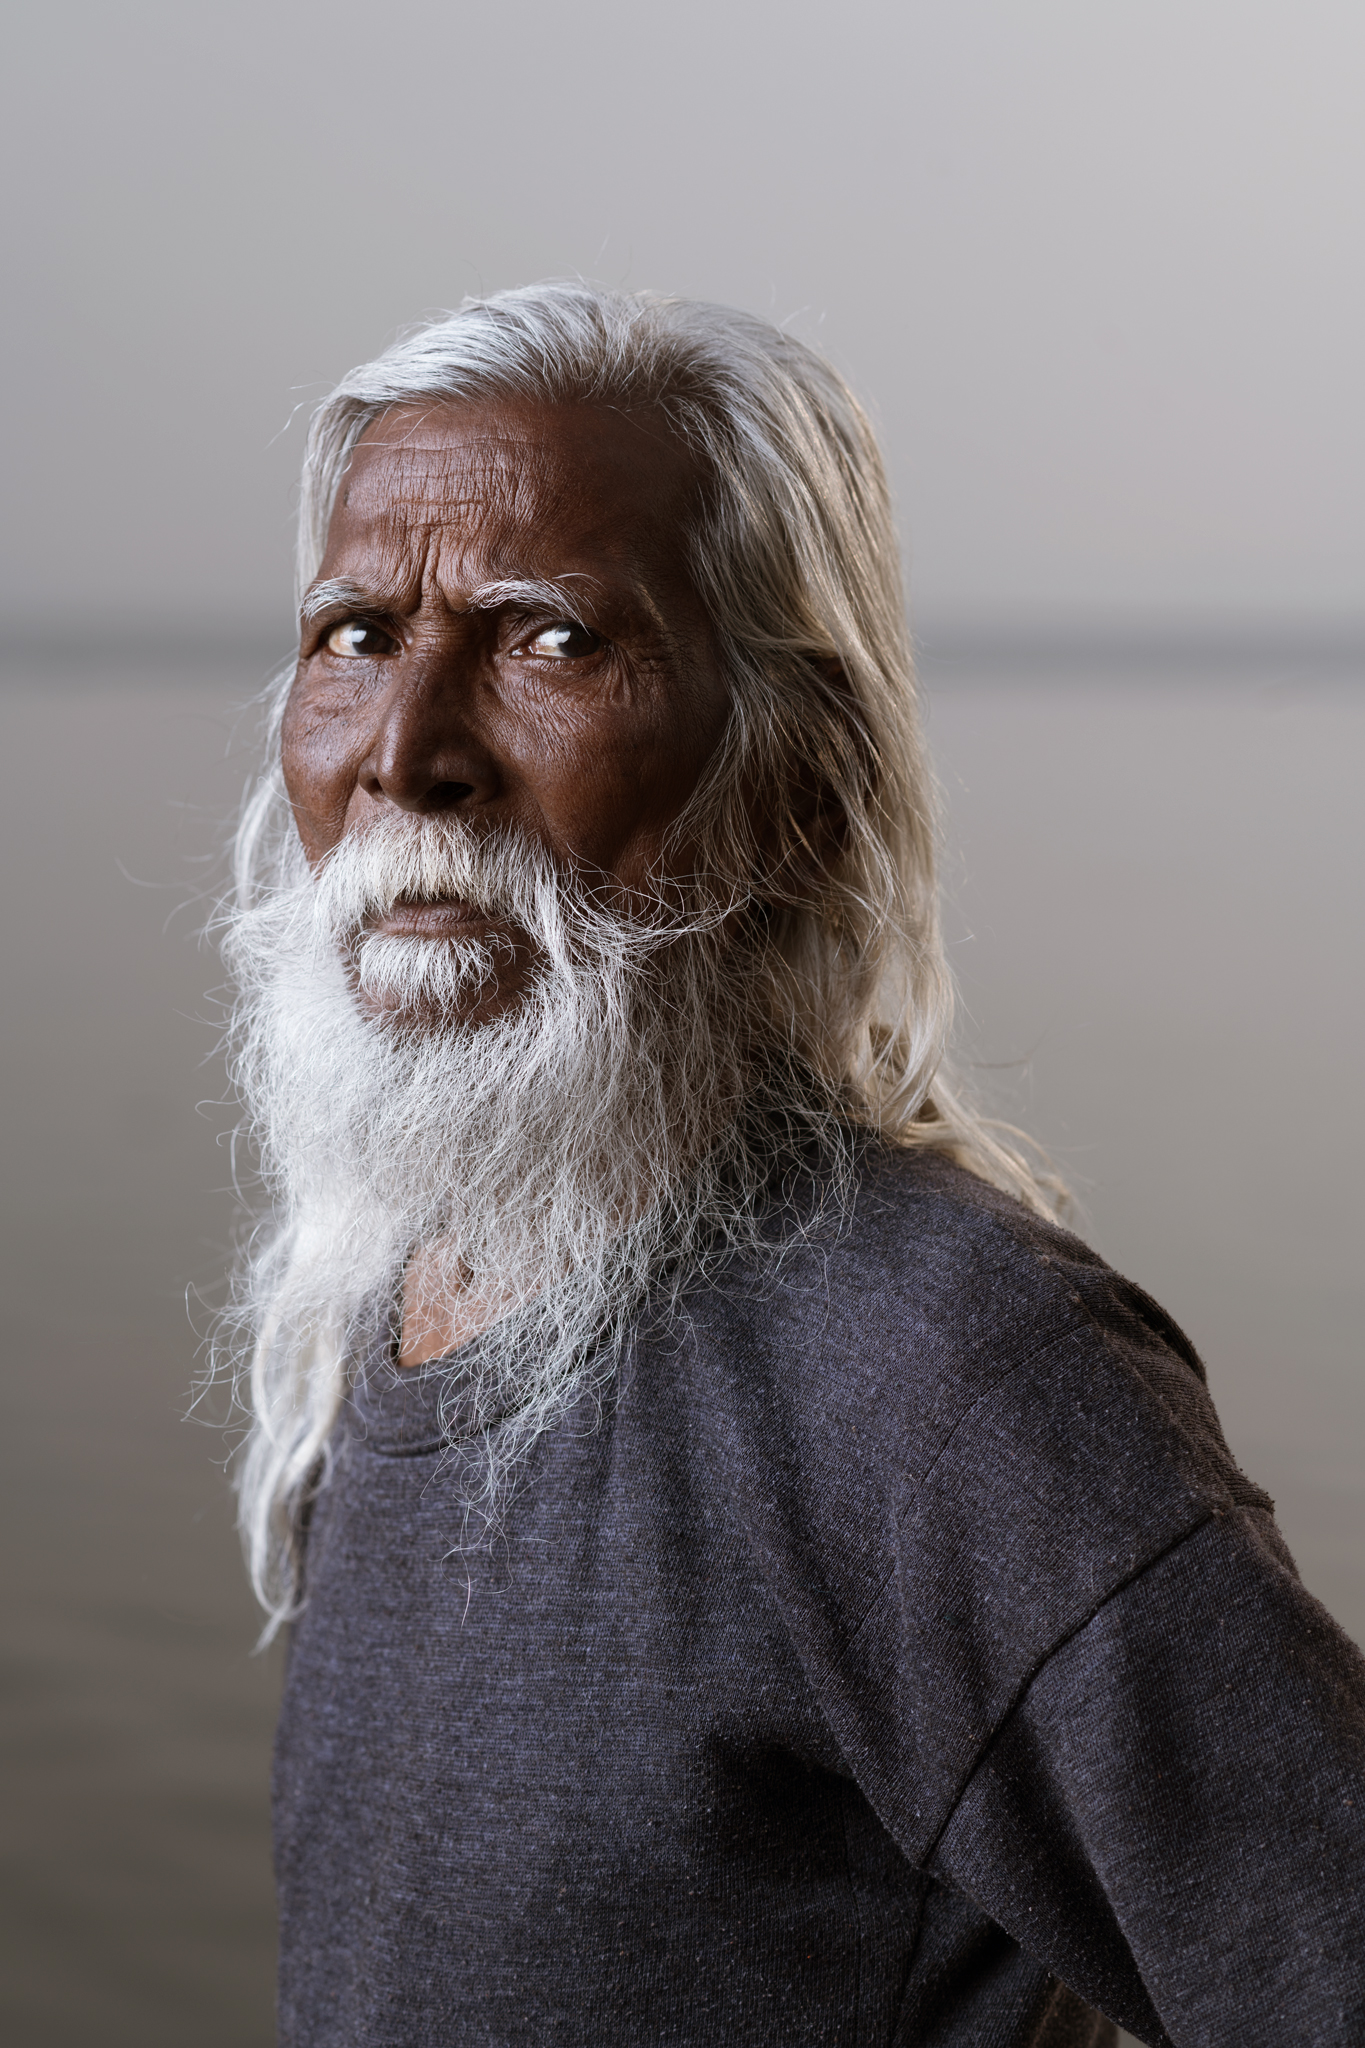 Varanasi_portrait_travel_photography_Manchester_Adventure_Photographer_Jan_Bella27.jpg